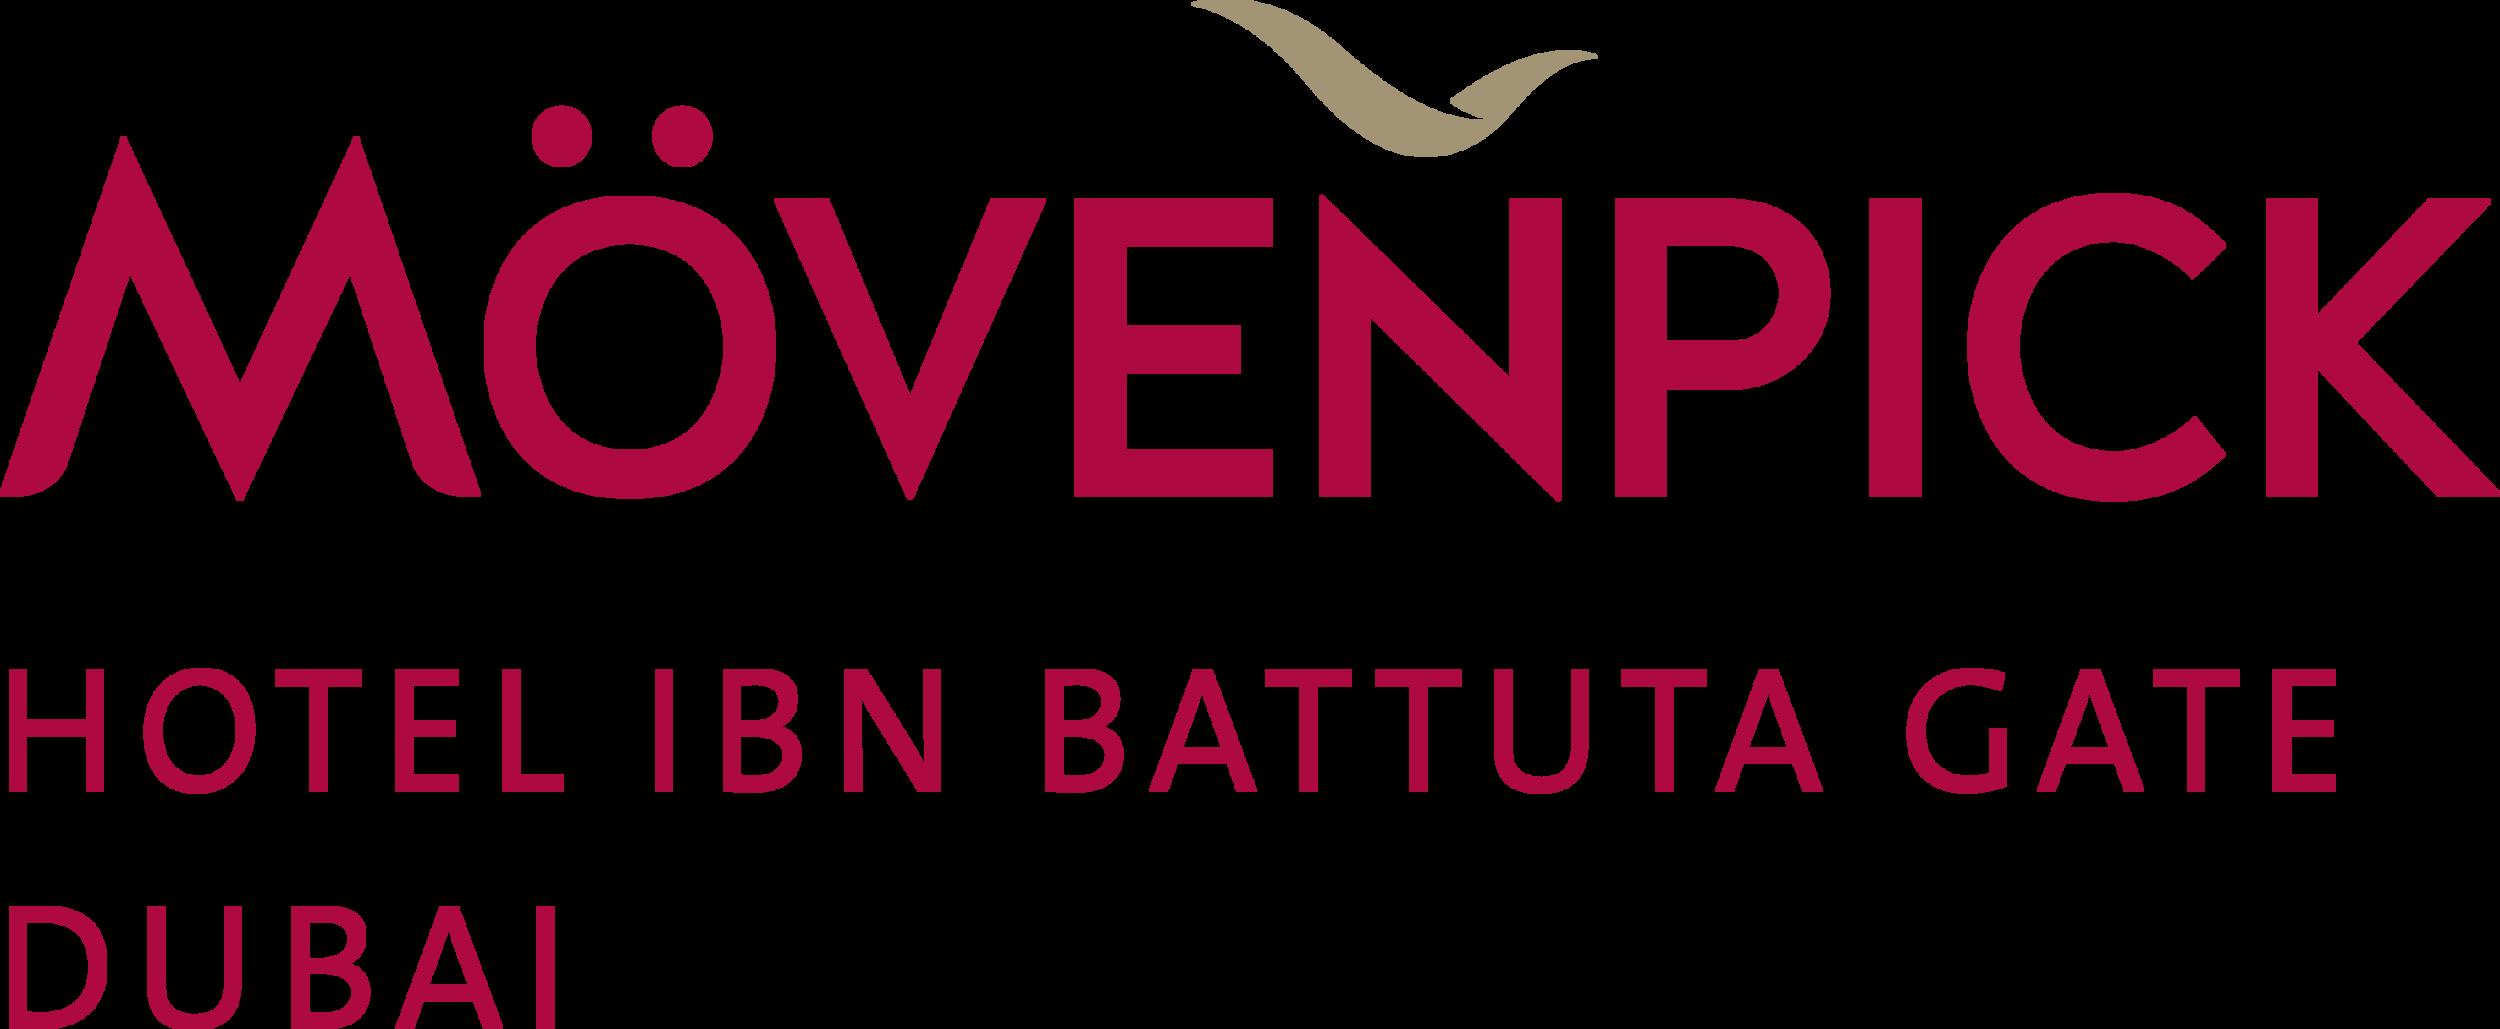 Ibn_Batuta logo-1.png